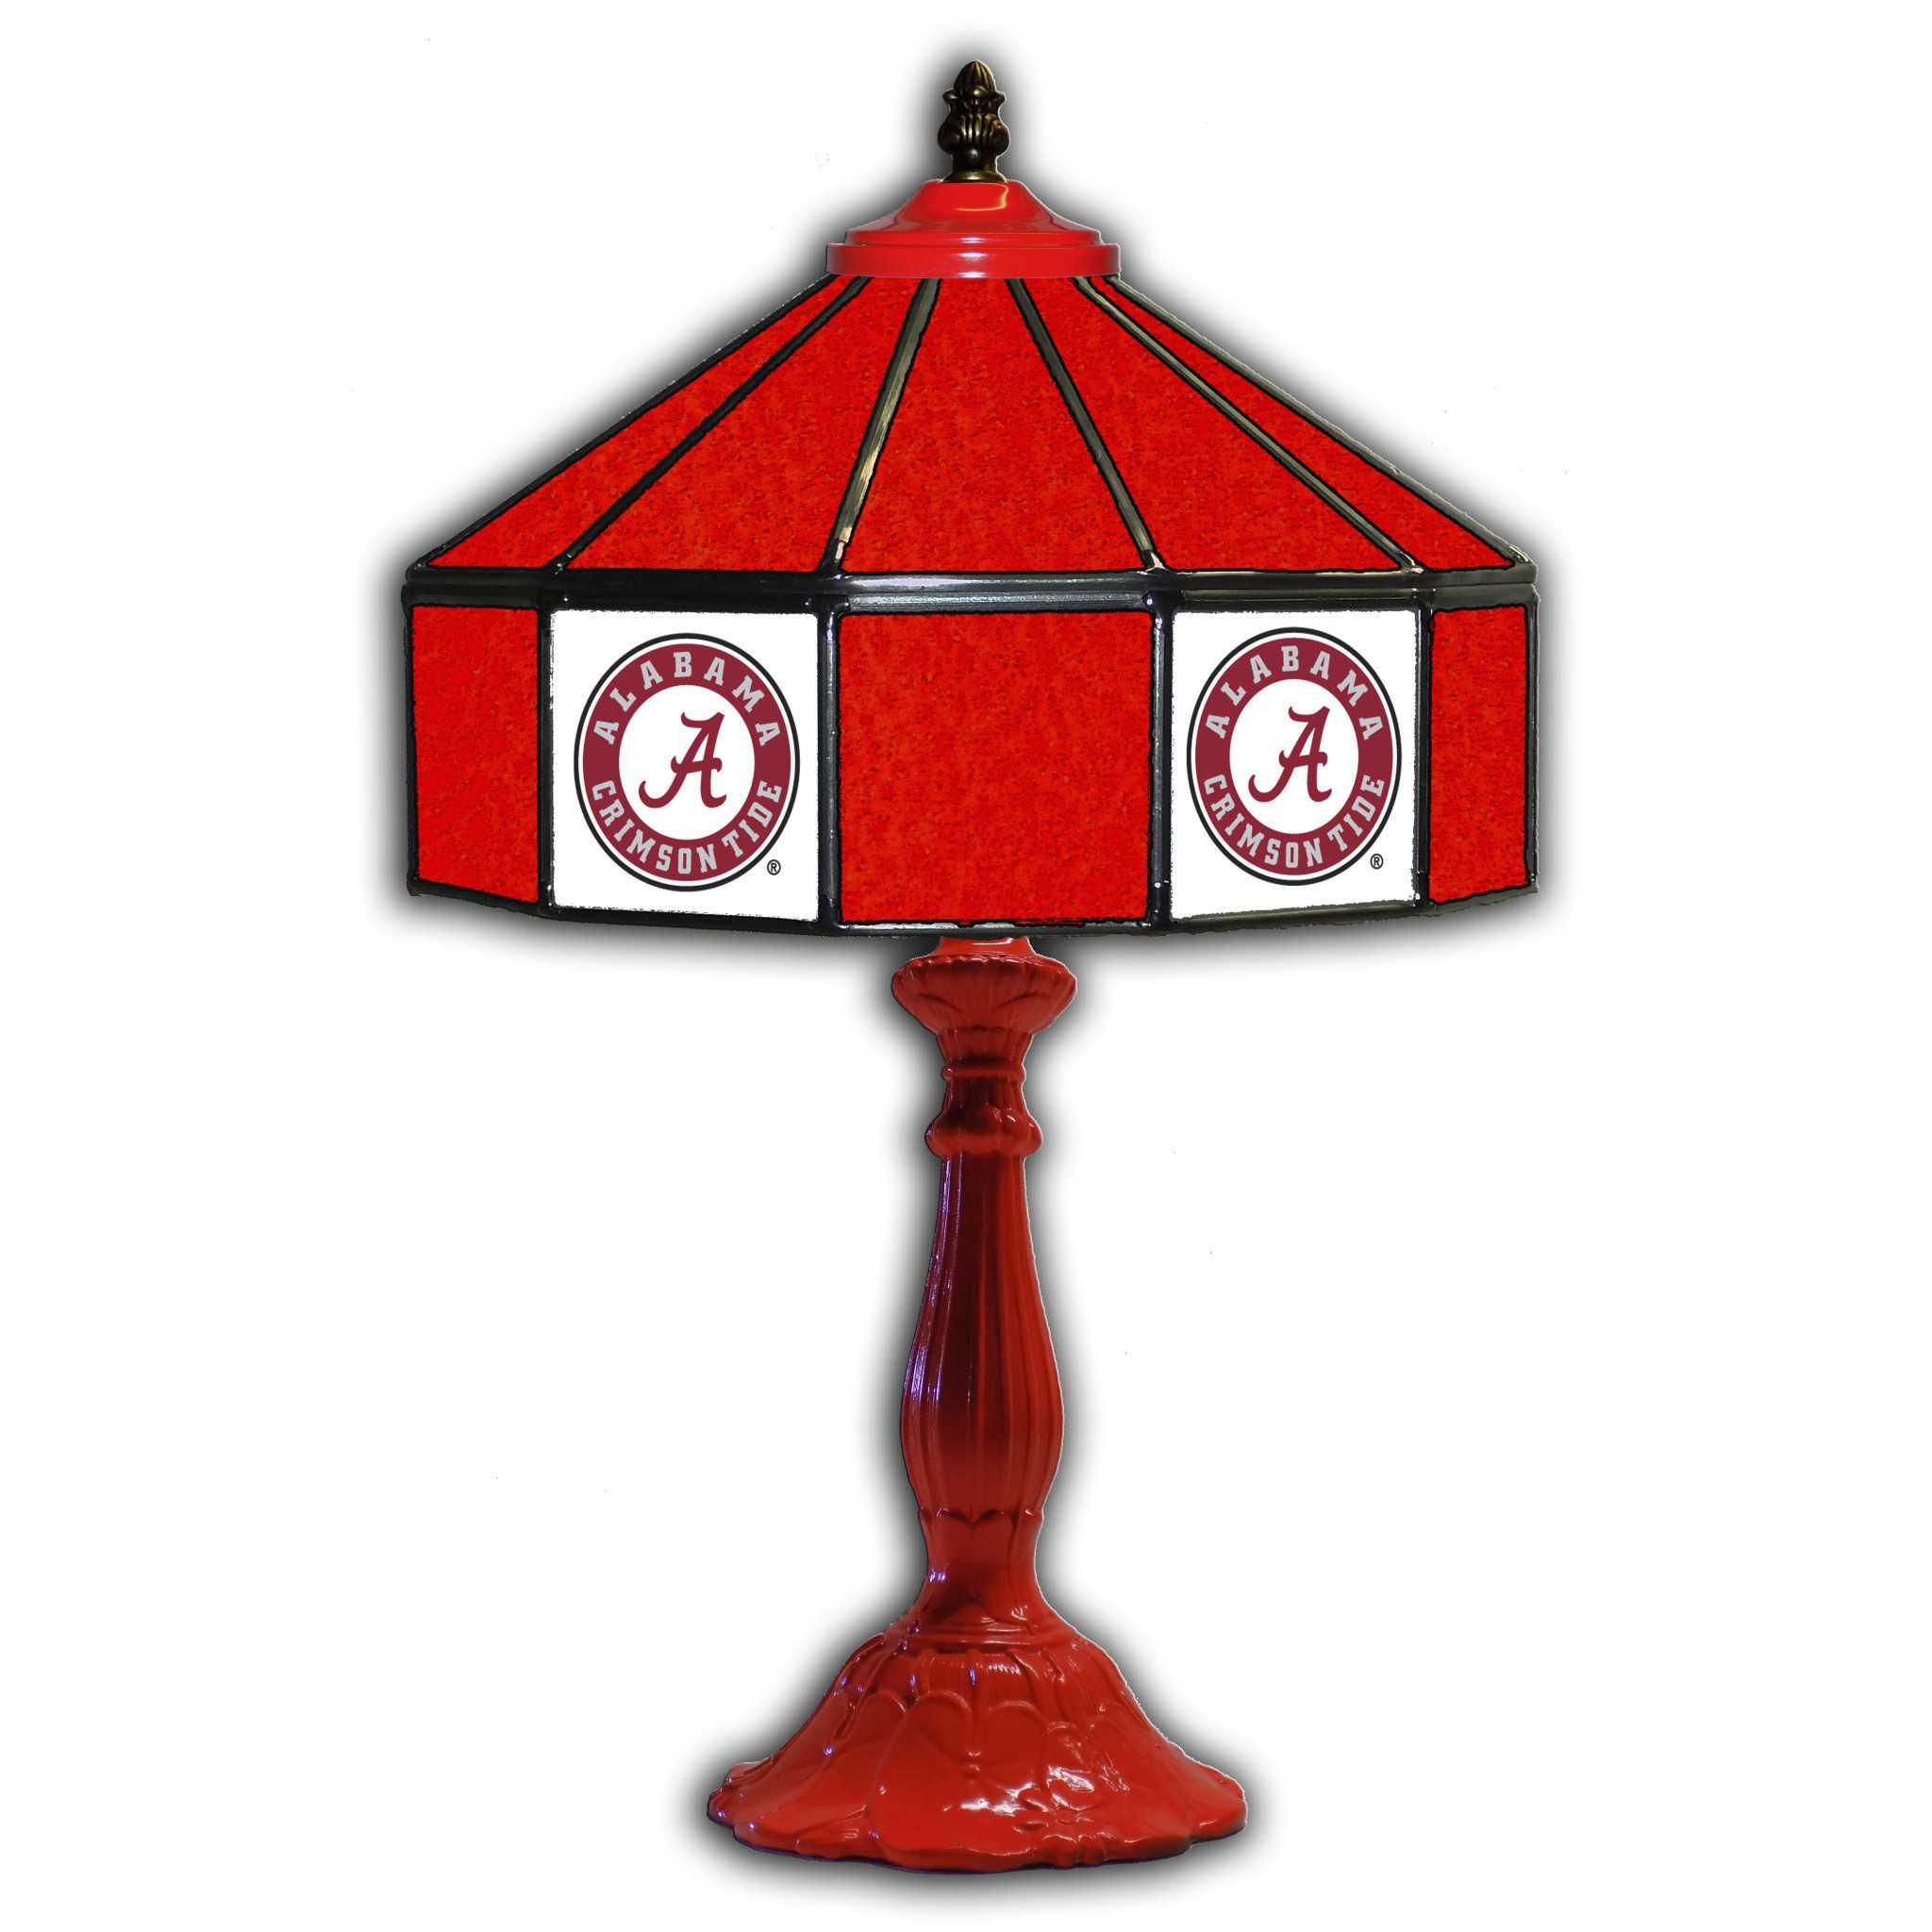 "ALABAMA UNIVERSITY 21"" GLASS TABLE LAMP"